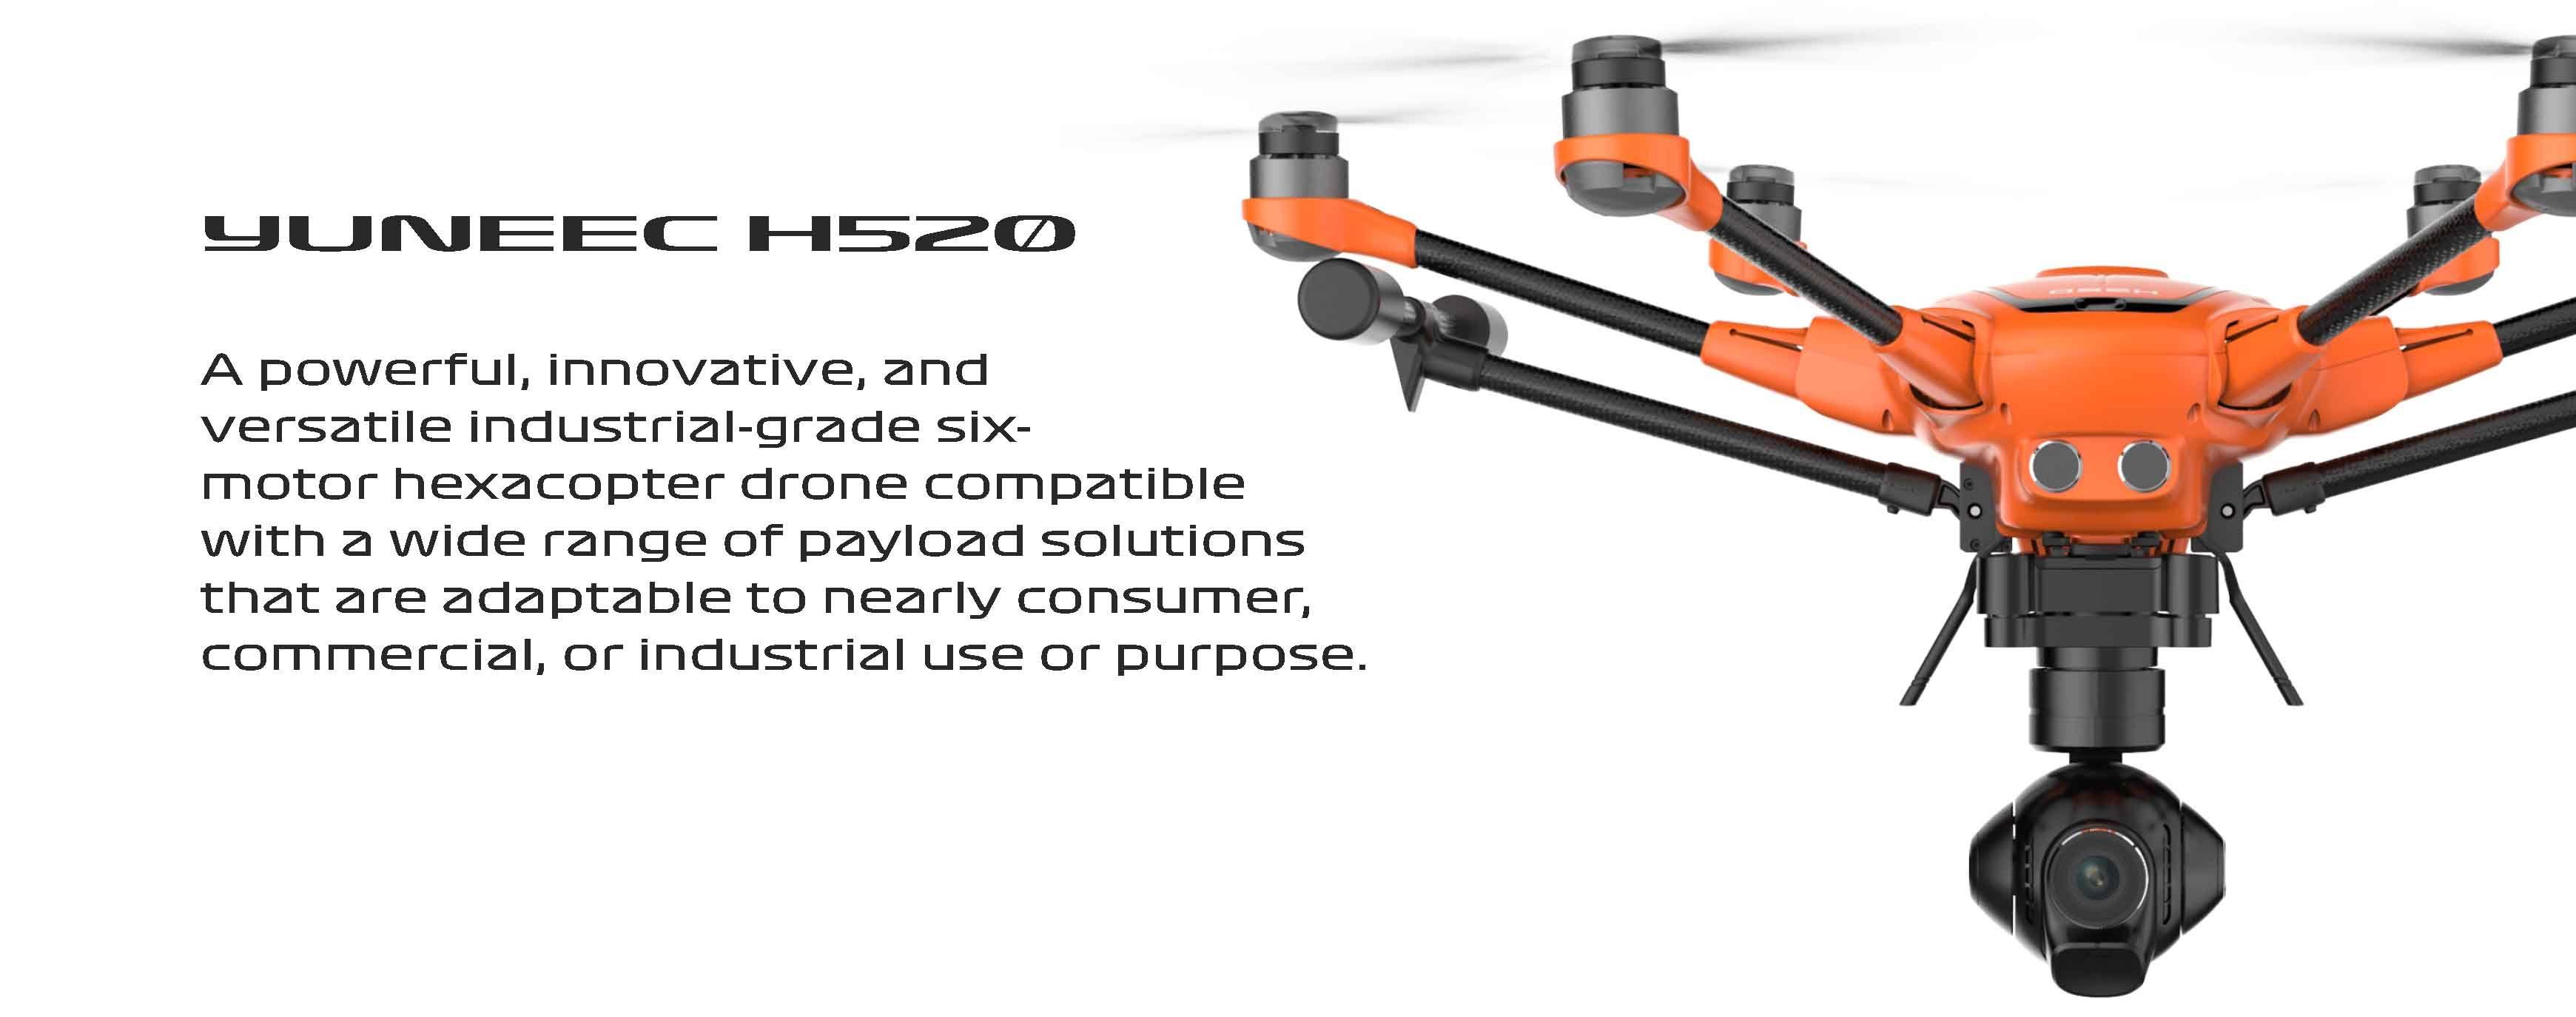 STORM Racing Drone (RTF / SRD195 / BetaFlight) Drone